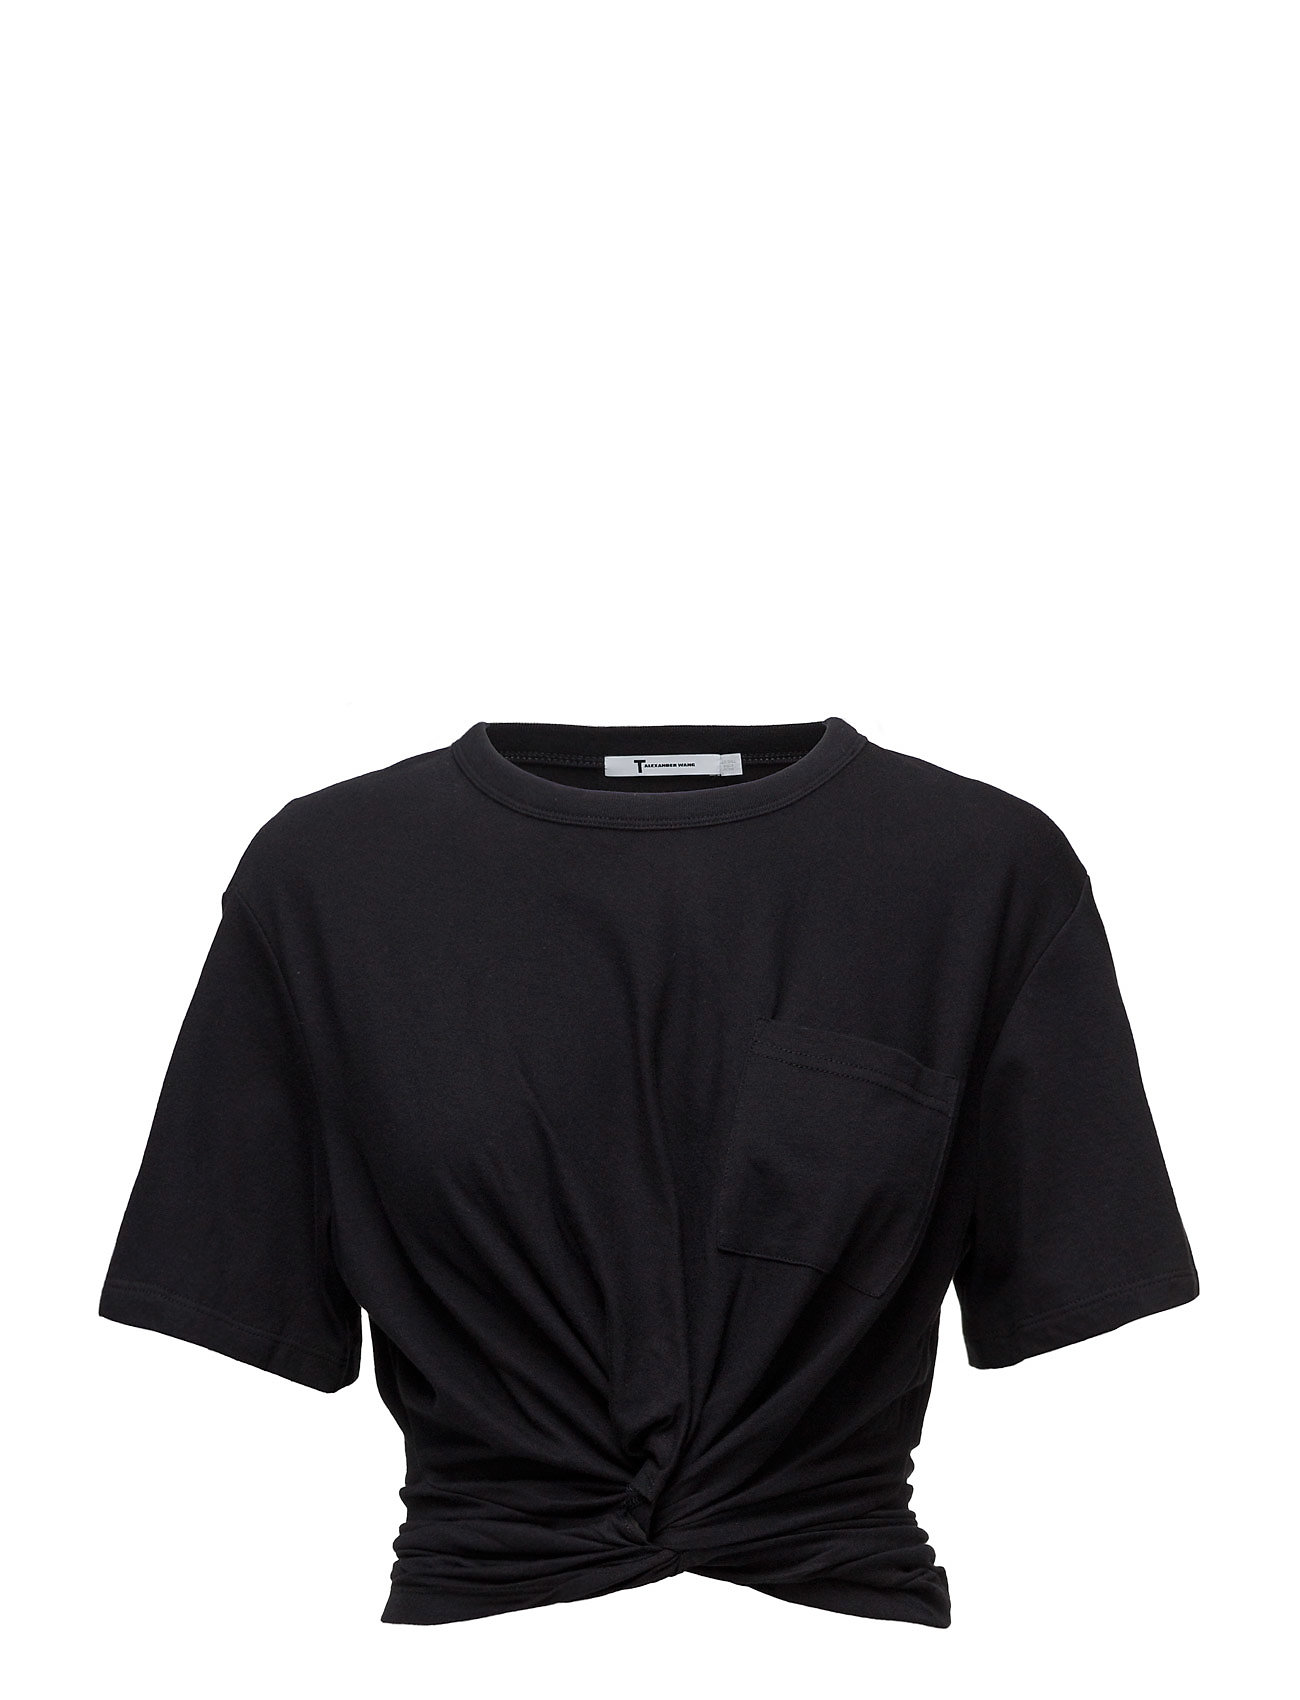 Cotton jersey front twistshort sleeve tee fra t by alexander wang på boozt.com dk